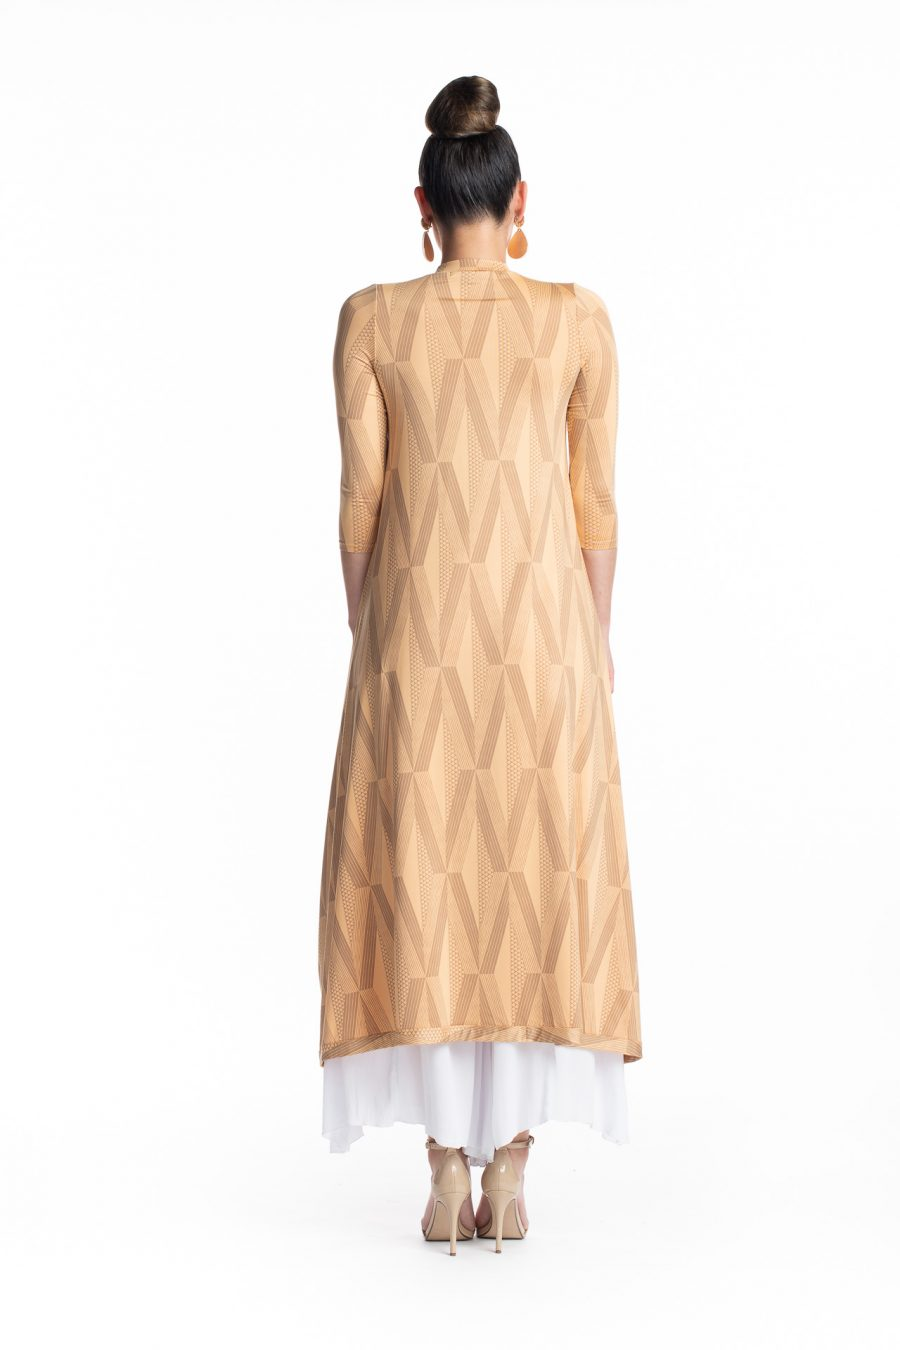 Female model wearing the Kalu Kalu Hi Low Dress in Clay Tannin - Back View